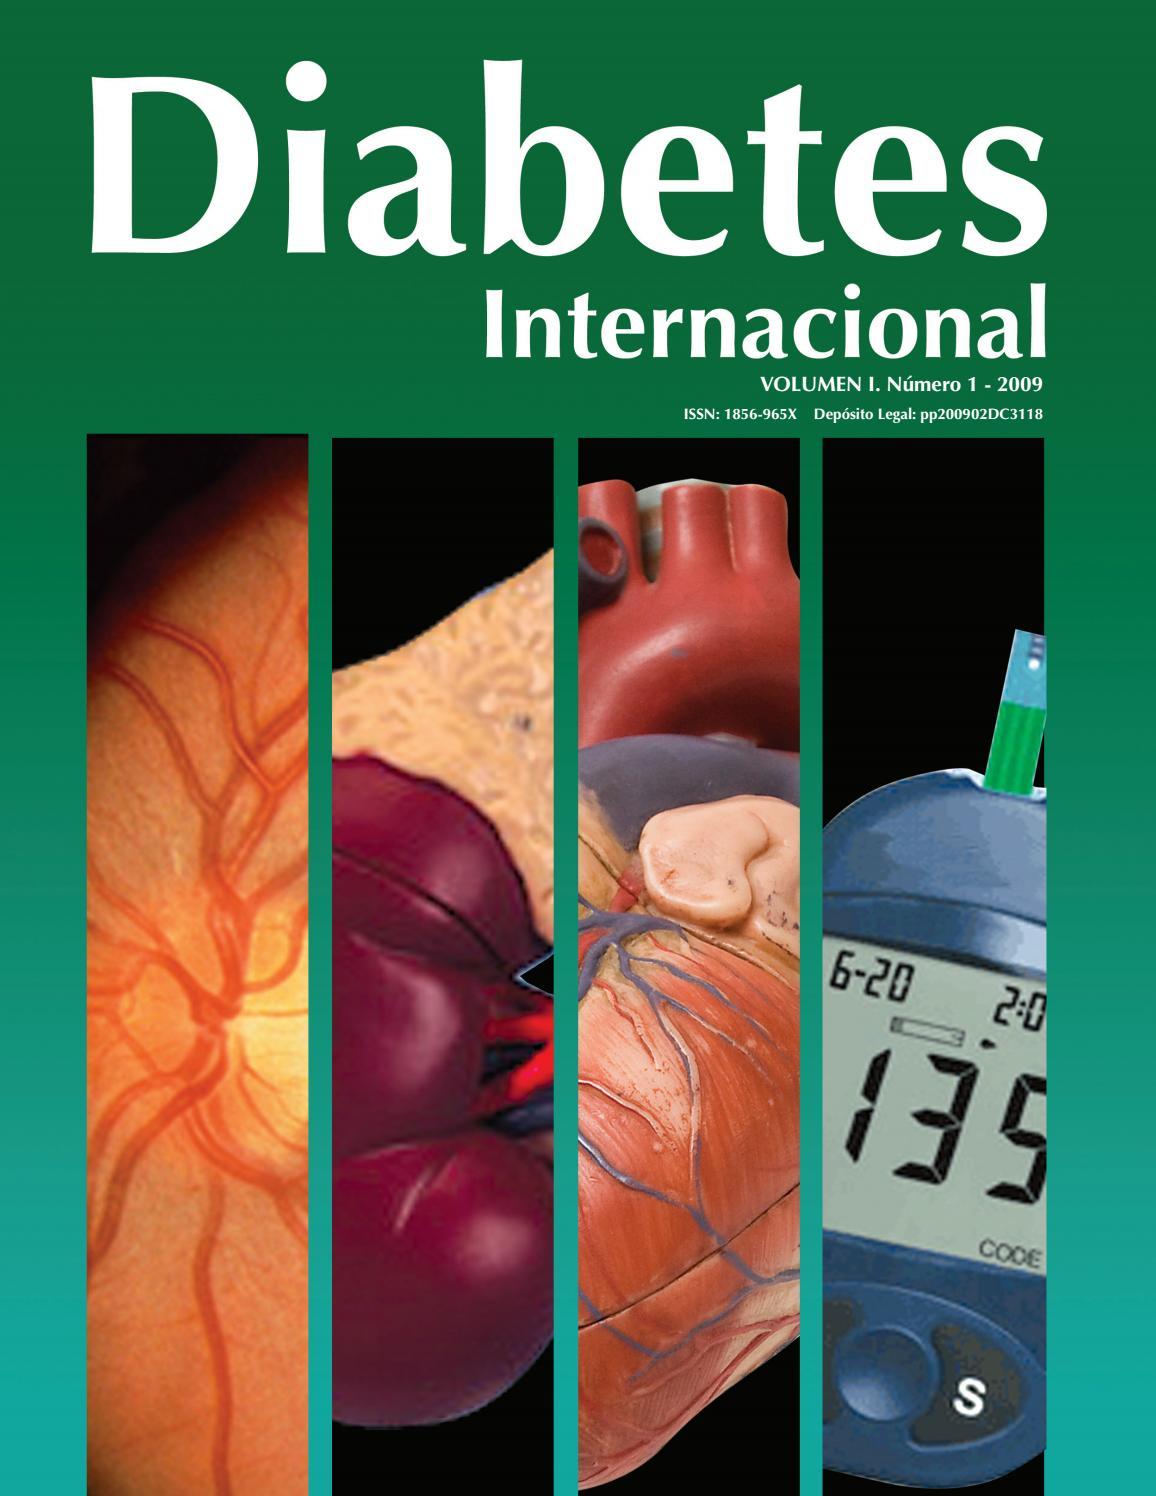 un diagnóstico de diabetes mellitus tipo 1 implica ese símbolo